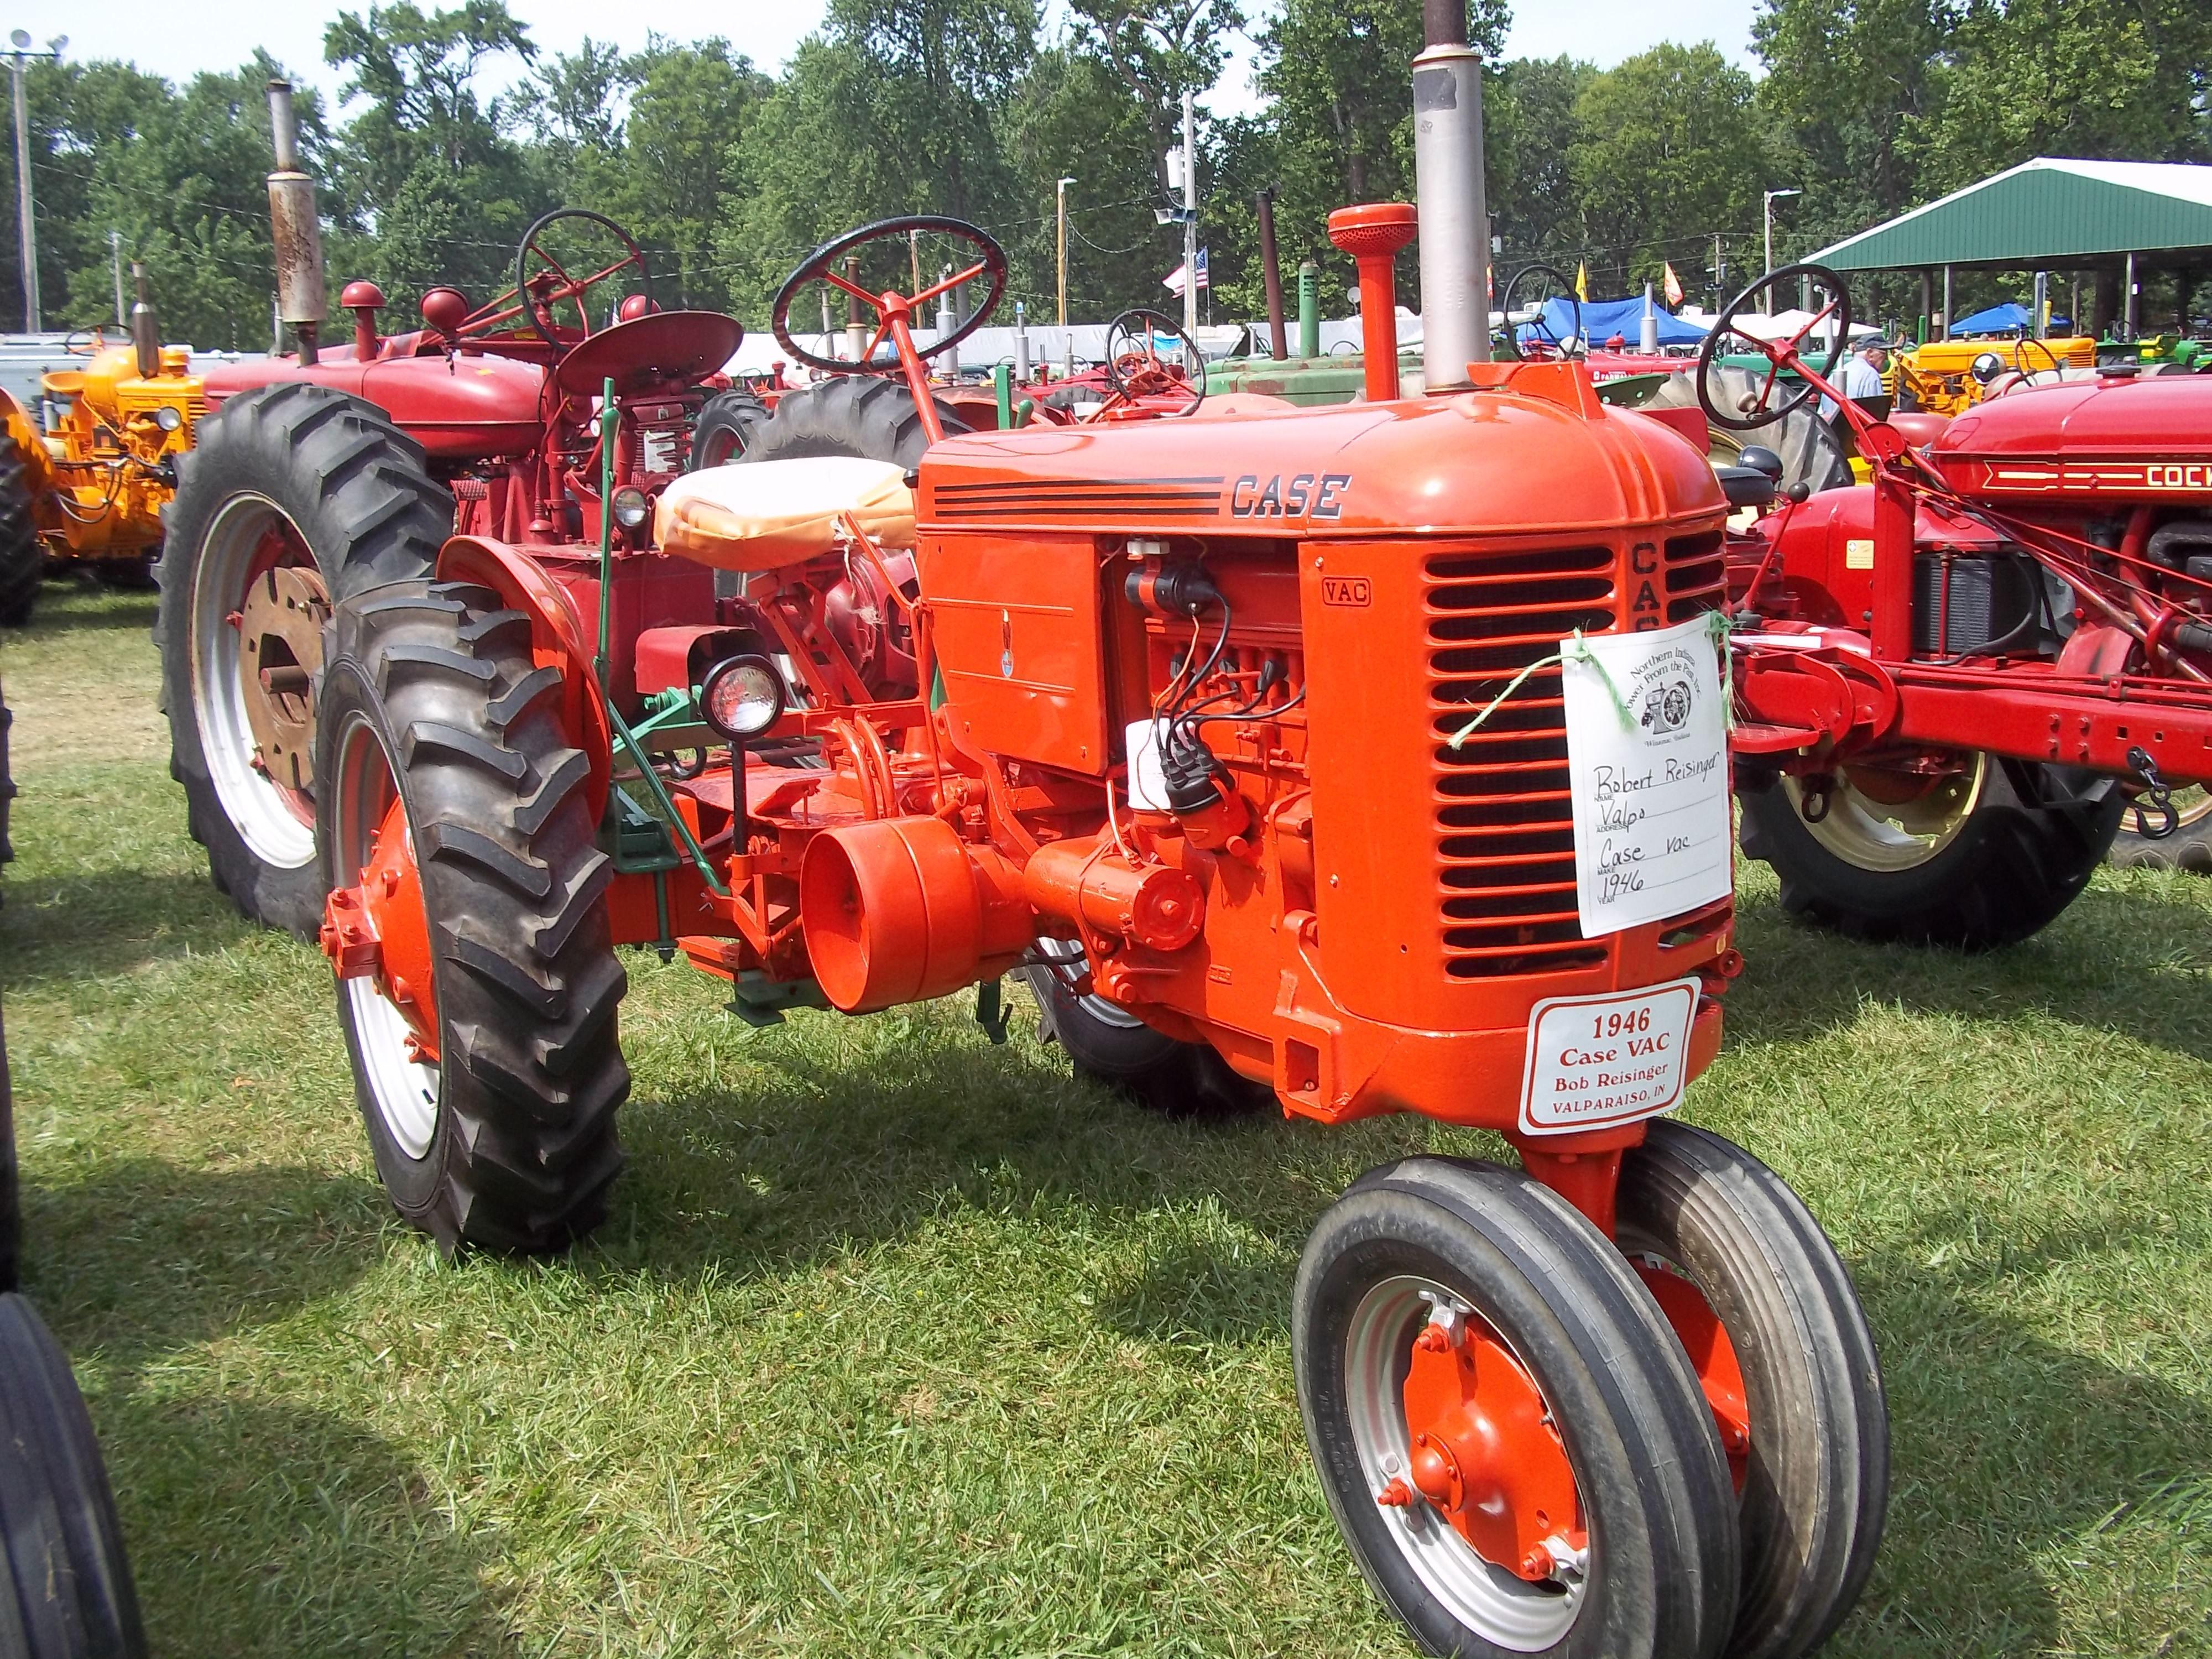 Case Vac Plowing : Case vac caseih equipment pinterest